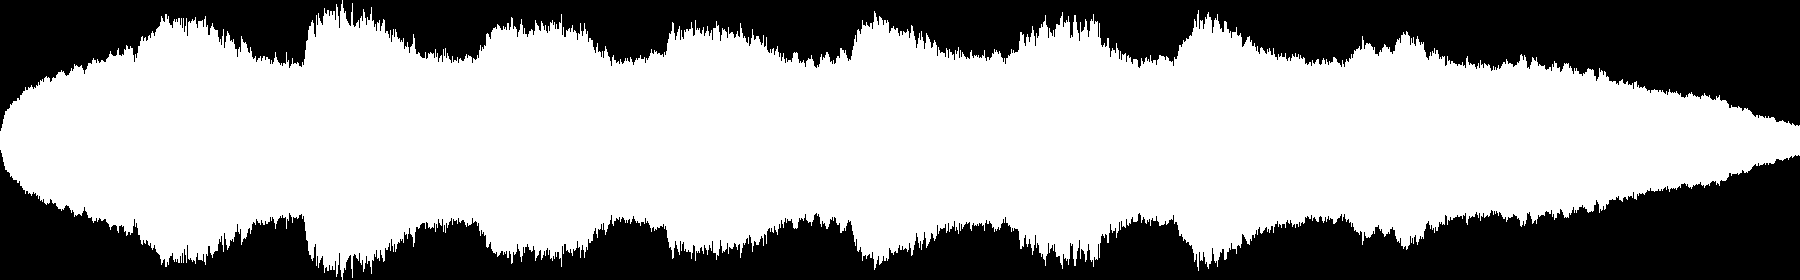 CHROMA audio waveform